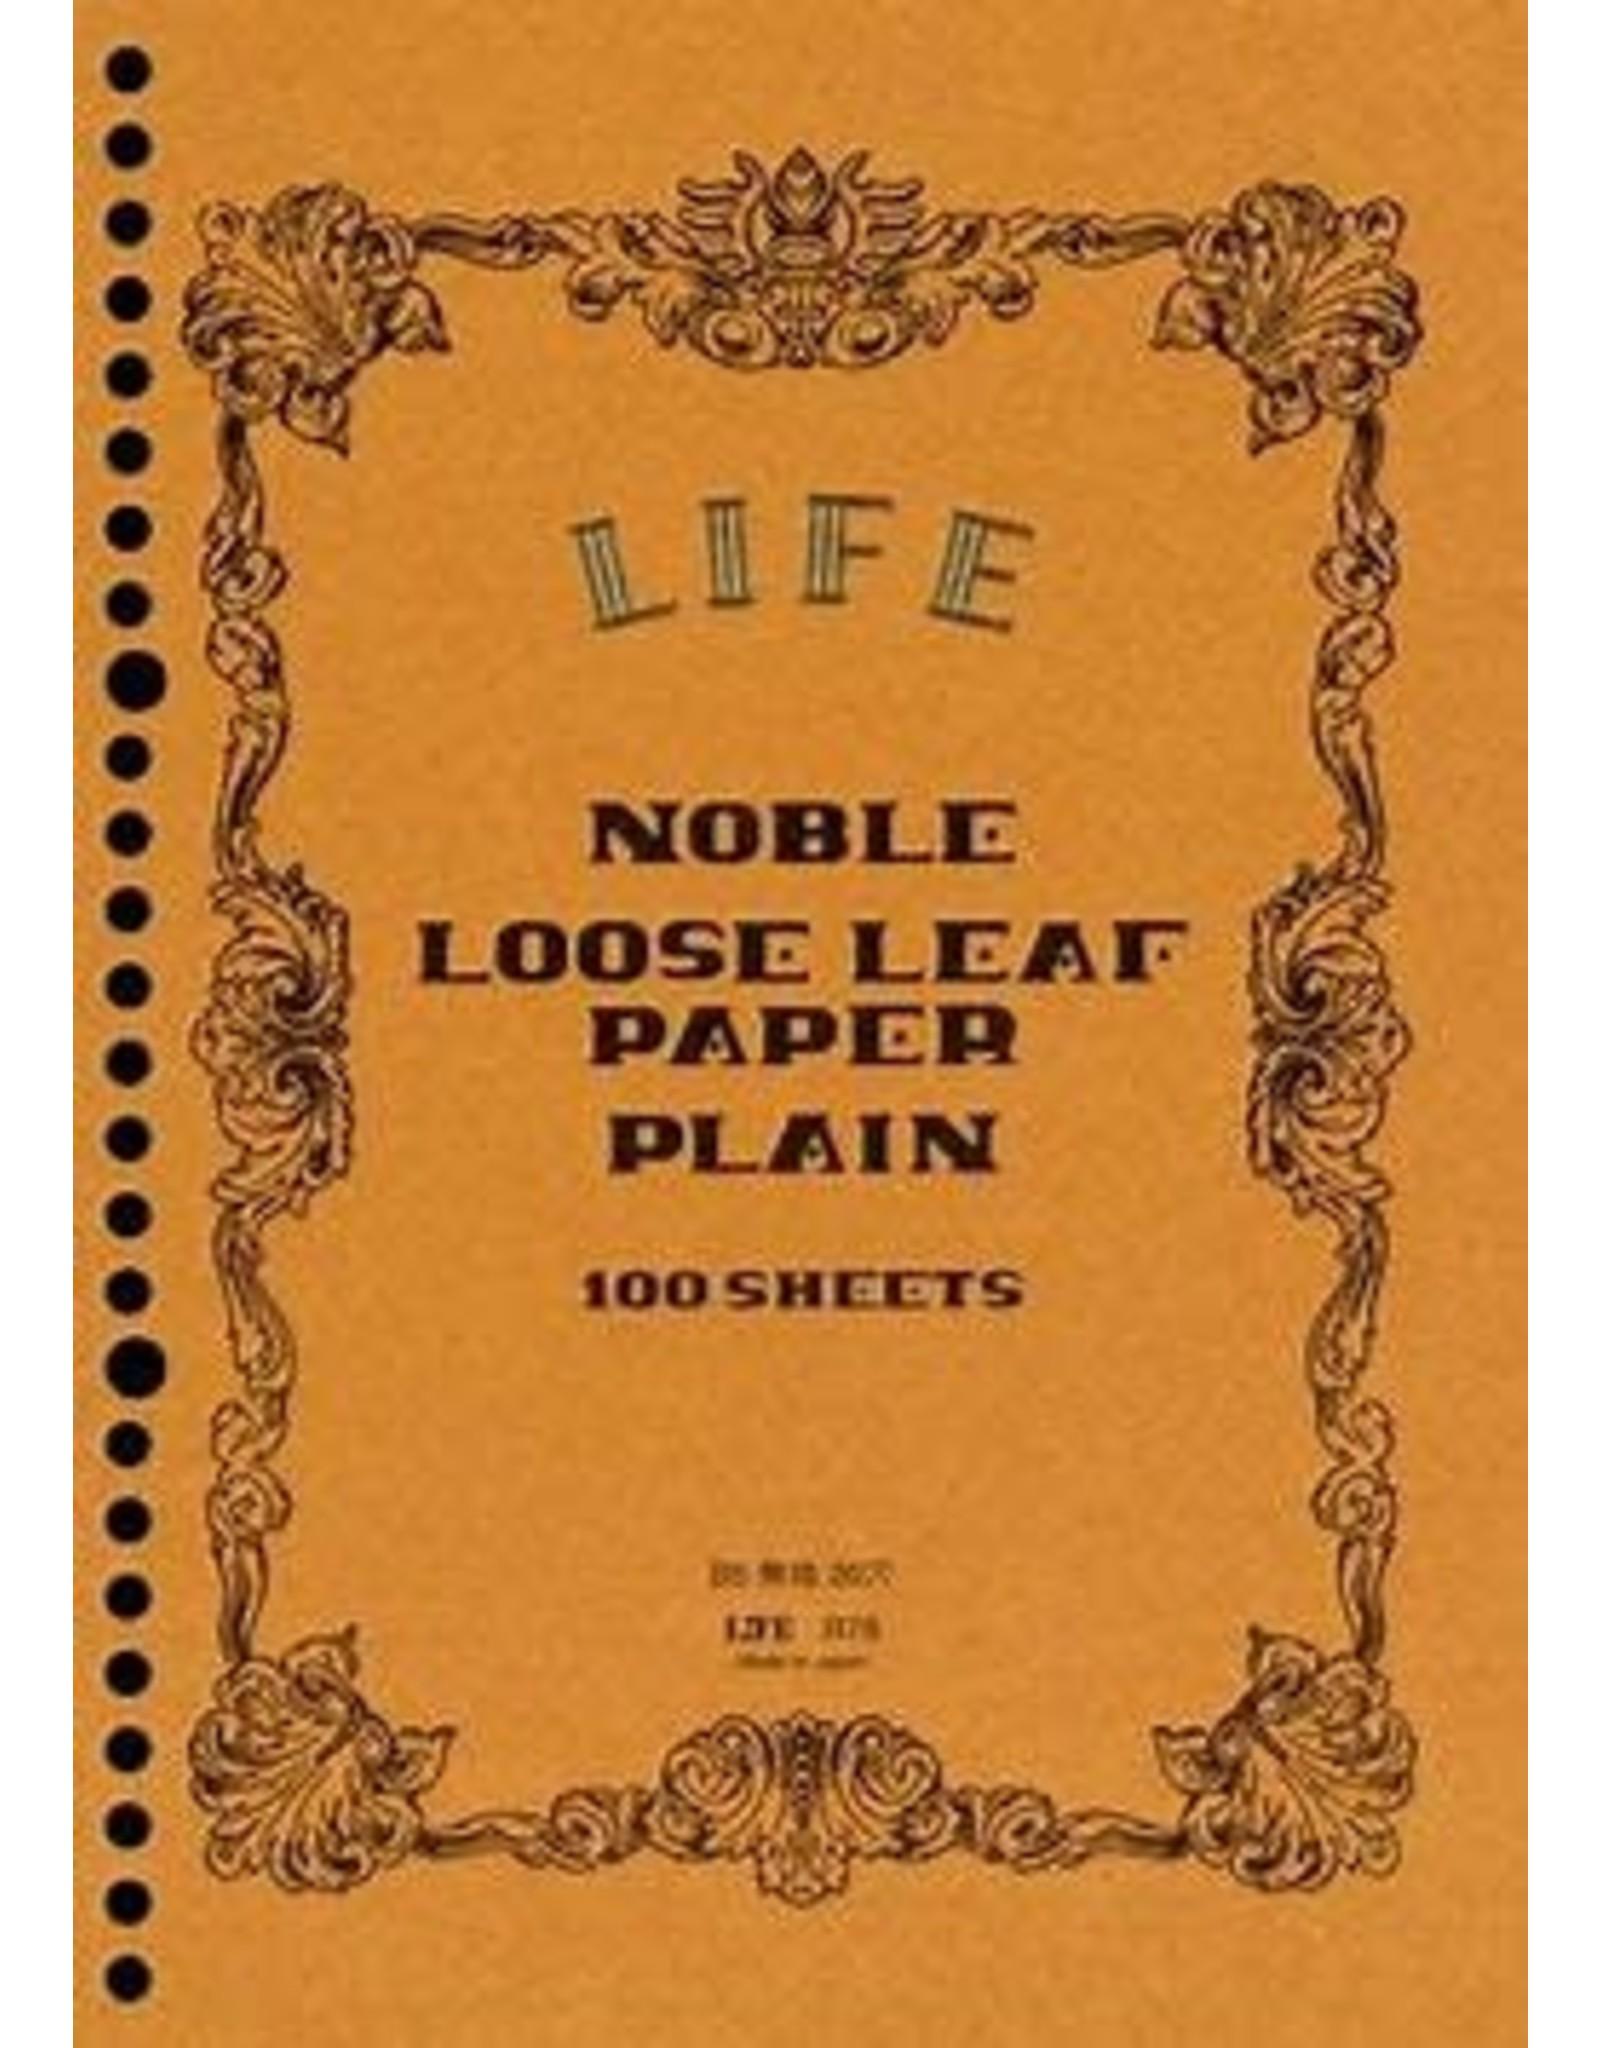 LIFE CO.,LTD. NOBLE LOOSE-LEAF A4 PLAIN